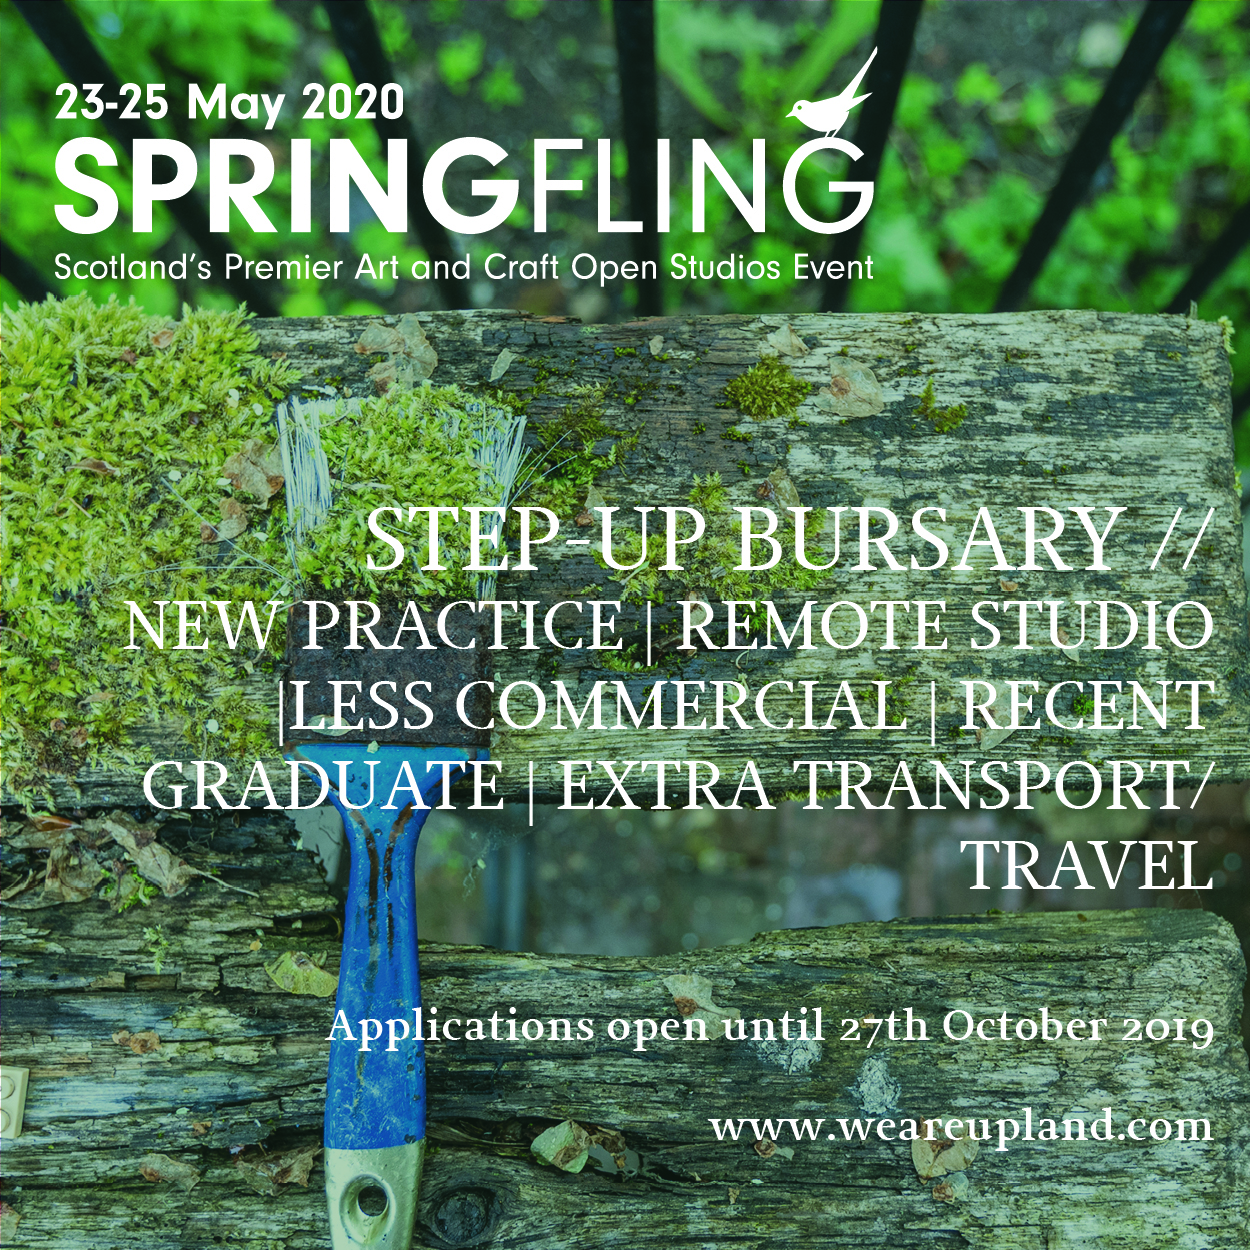 Spring Fling 2020 Applications Open Image #4